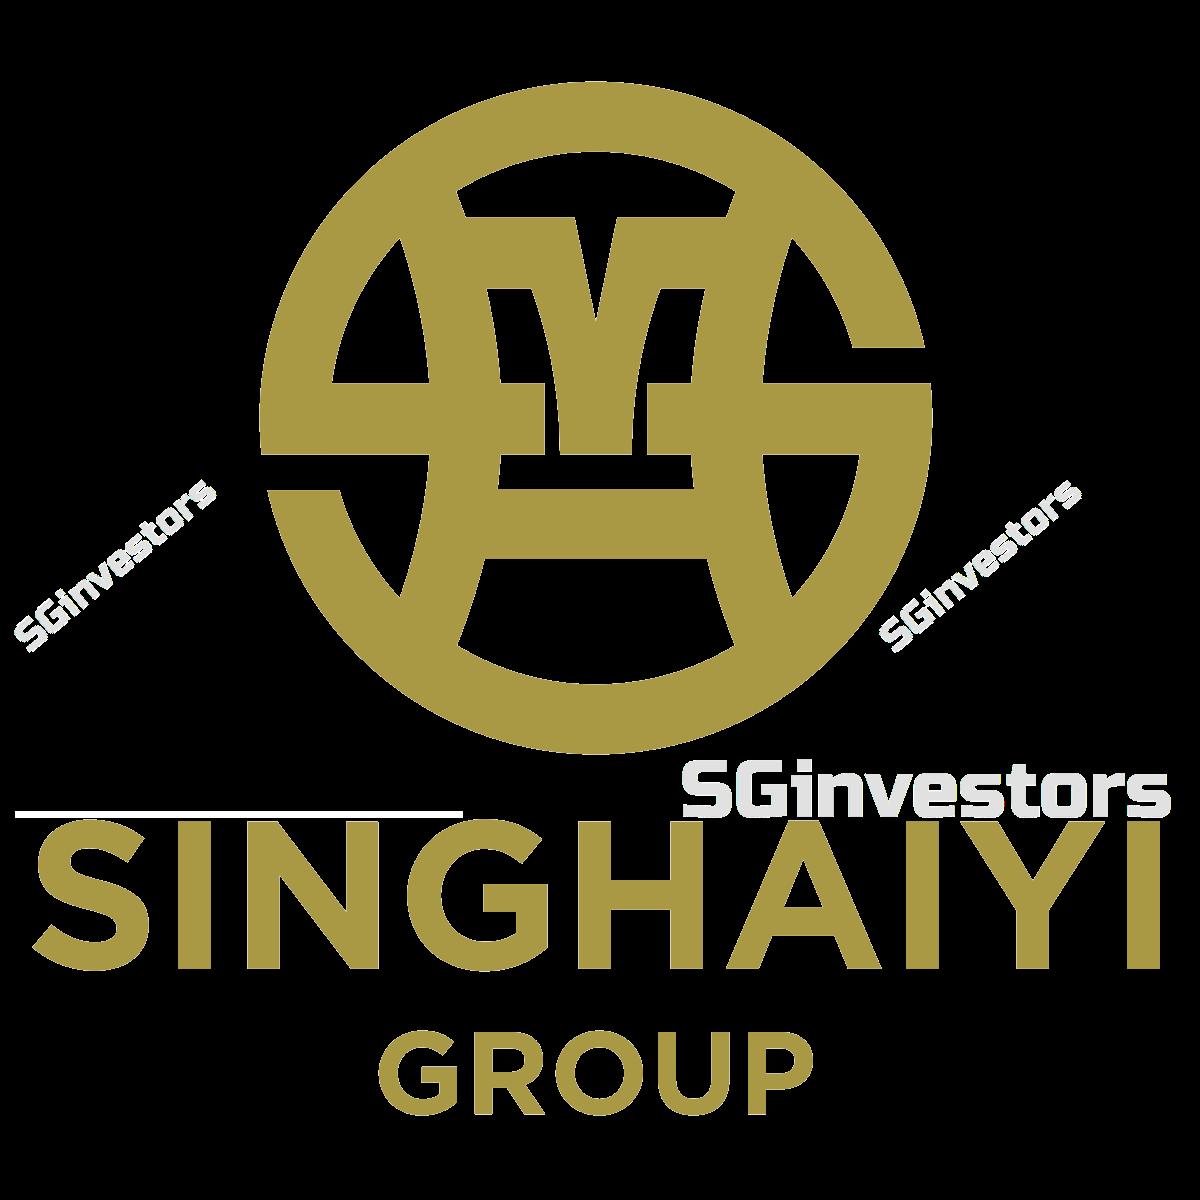 SINGHAIYI GROUP LTD. (SGX:5H0) @ SGinvestors.io